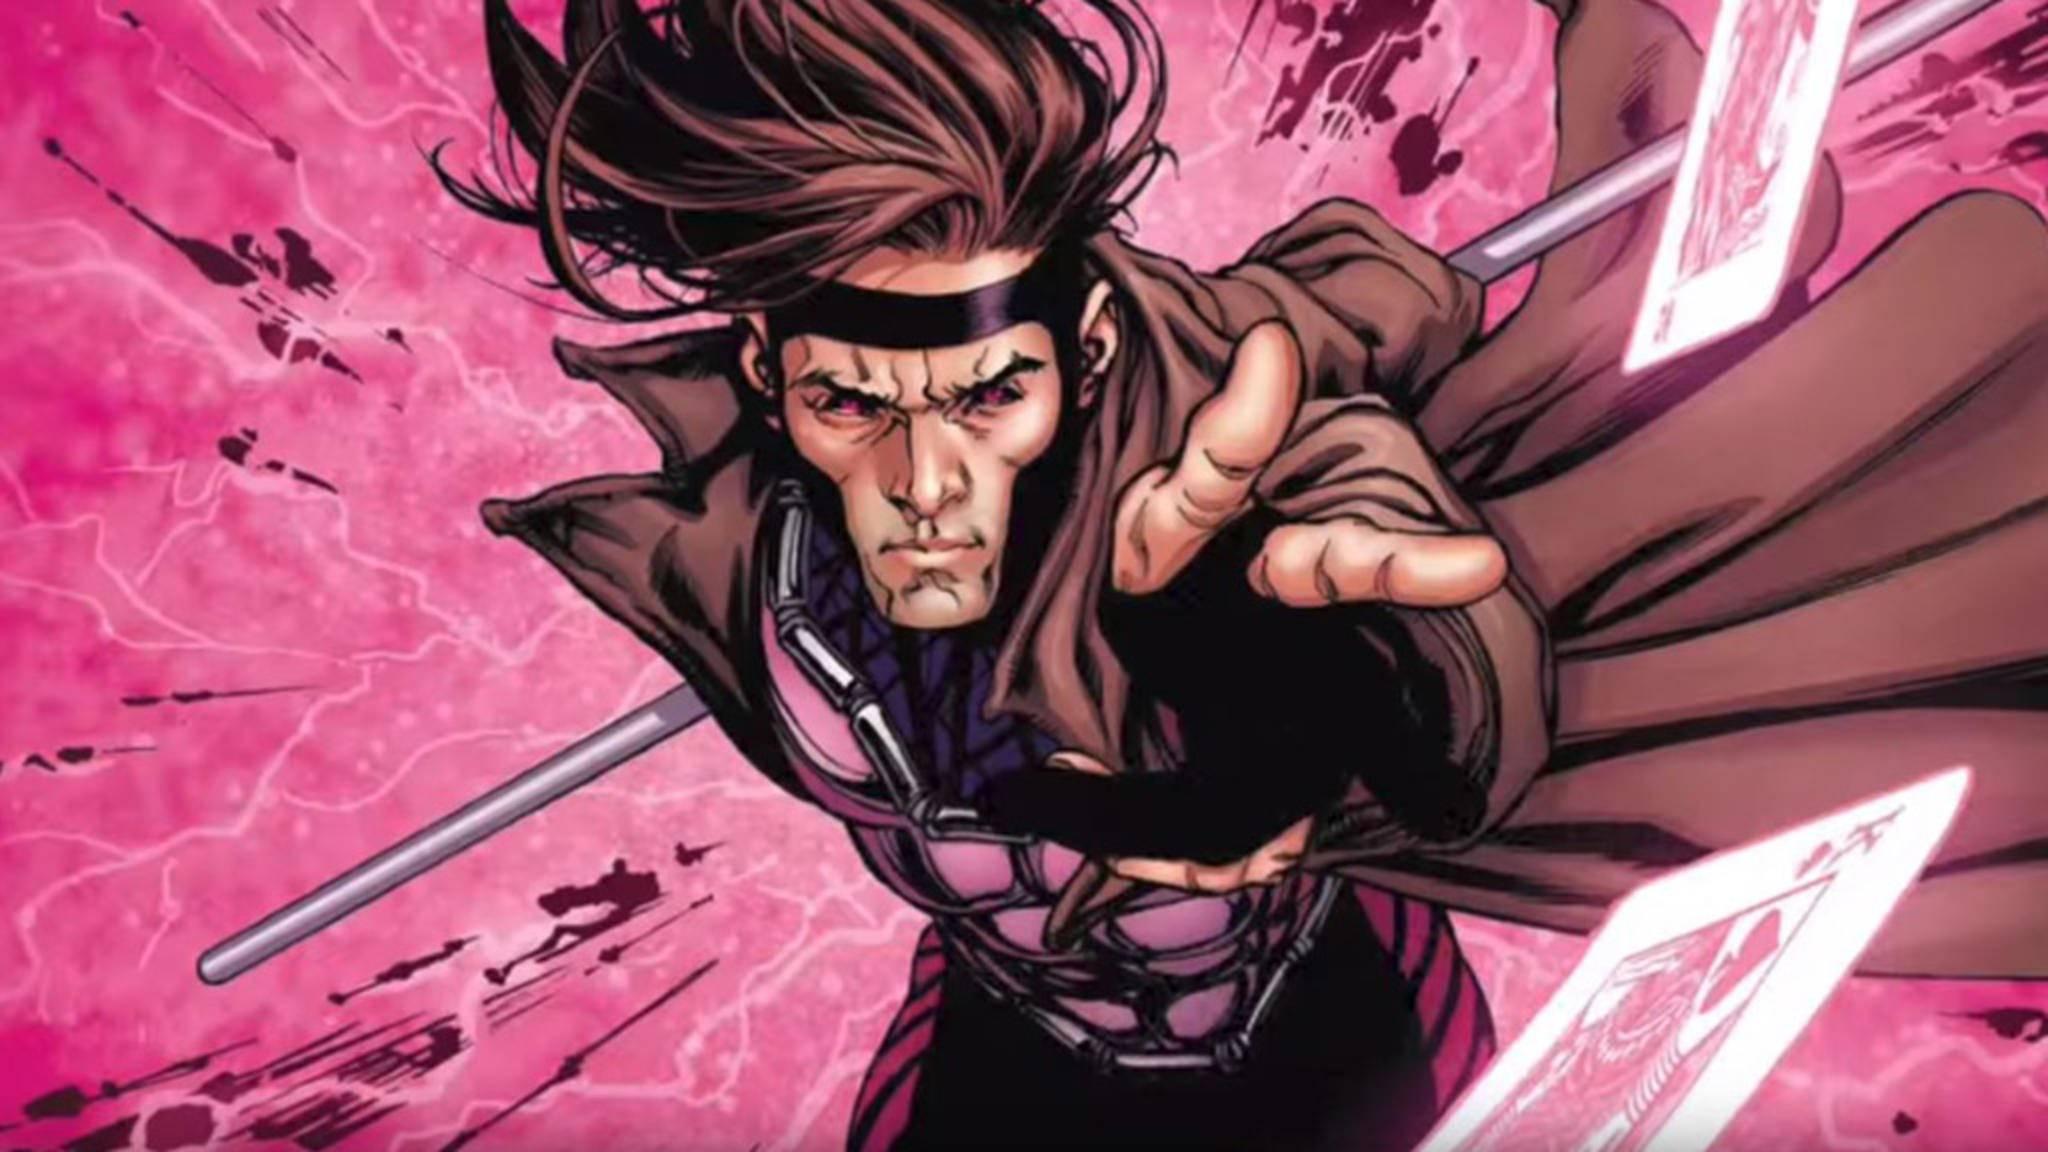 Comicverfilmung Gambit mit Channing Tatum kommt doch noch